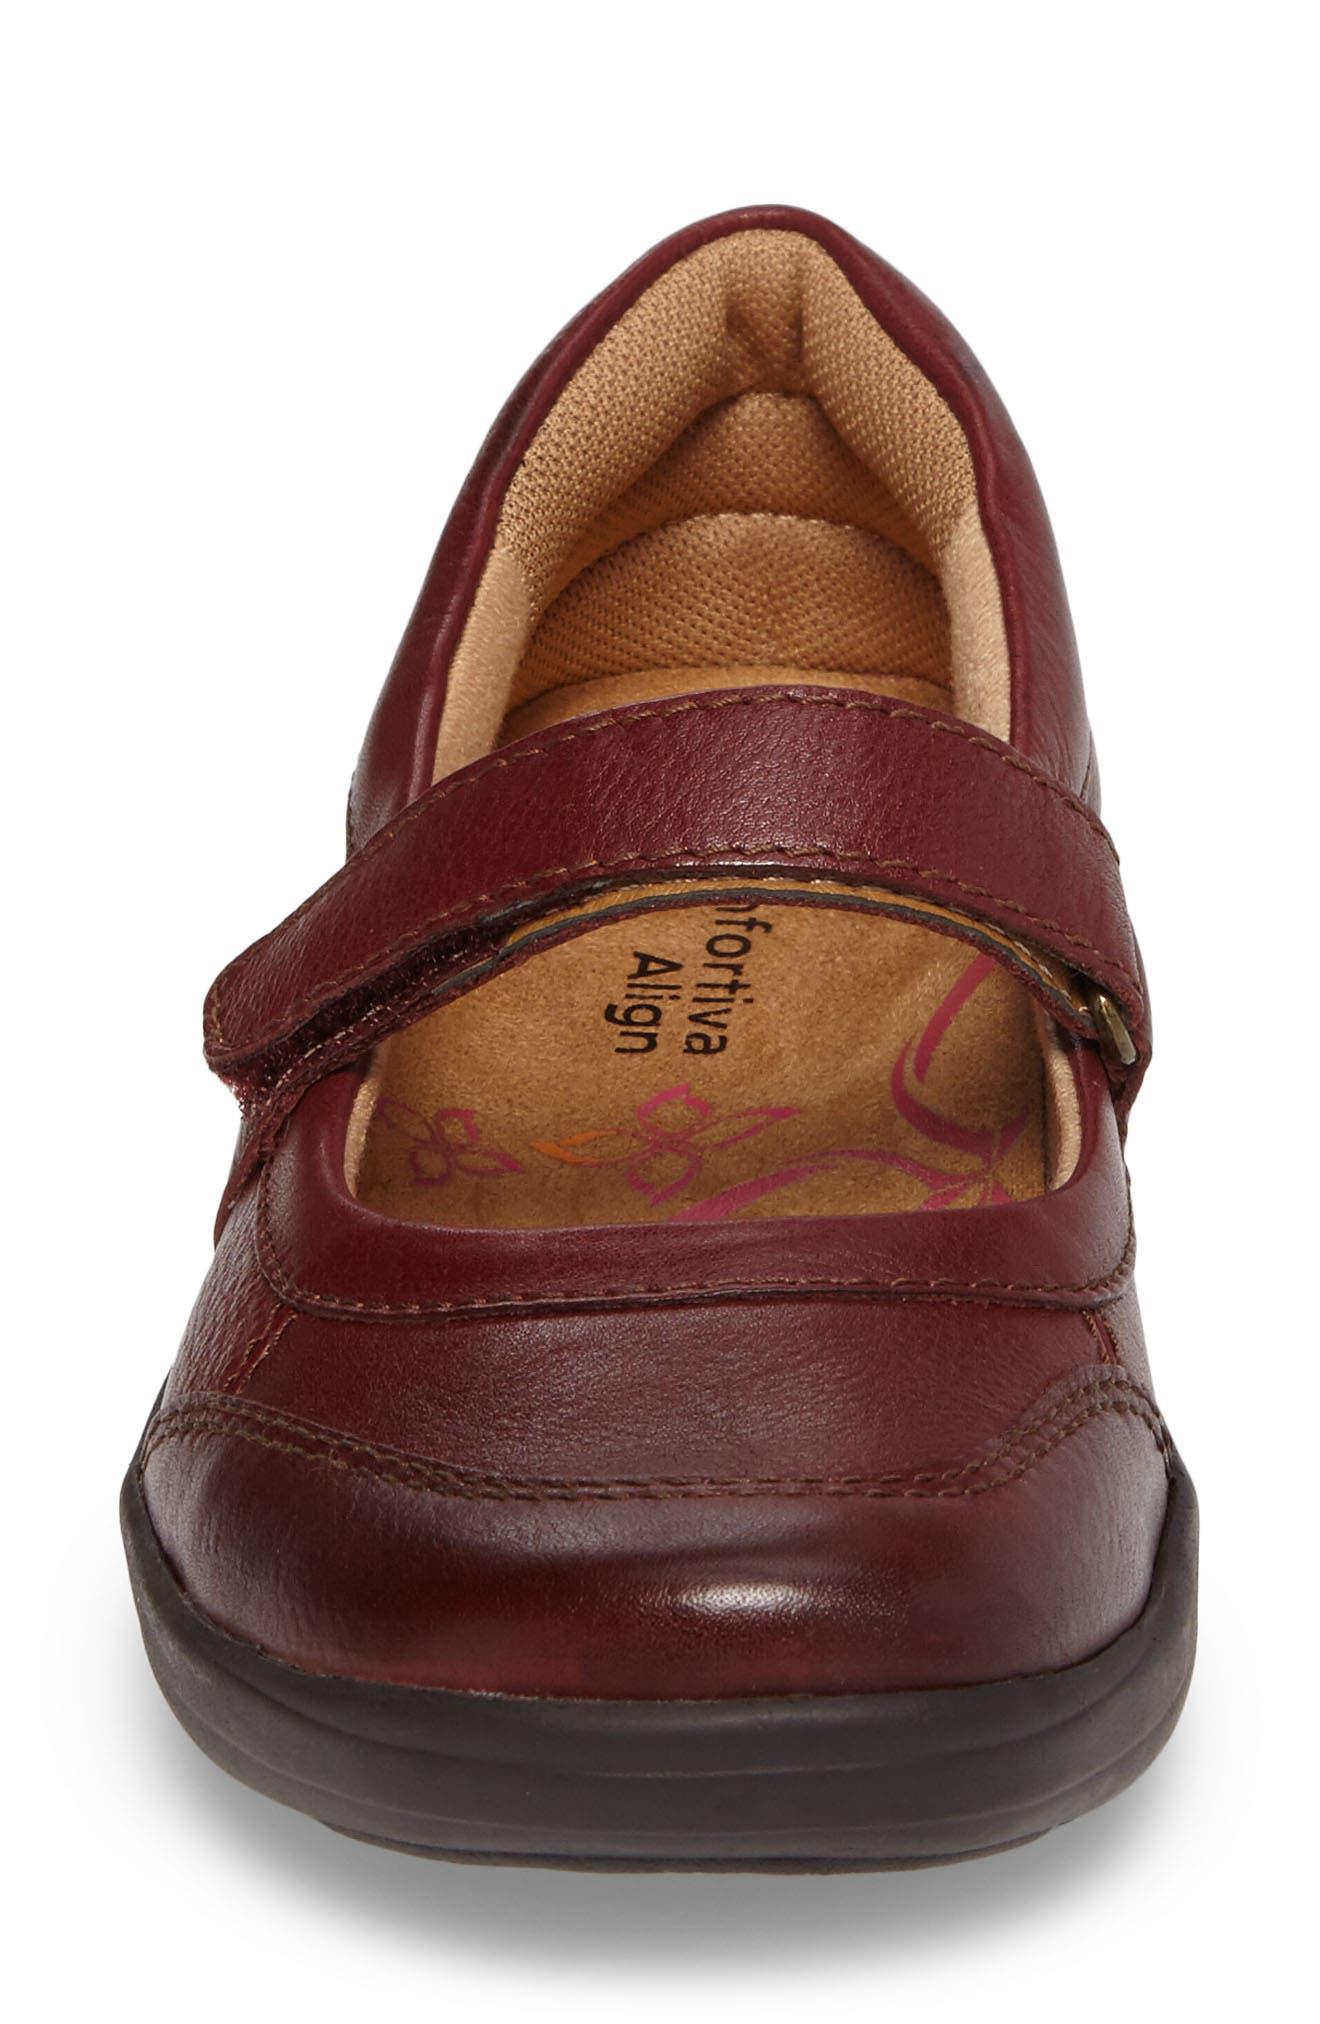 Roma Mary Jane Flat,                             Alternate thumbnail 4, color,                             Burgundy Leather